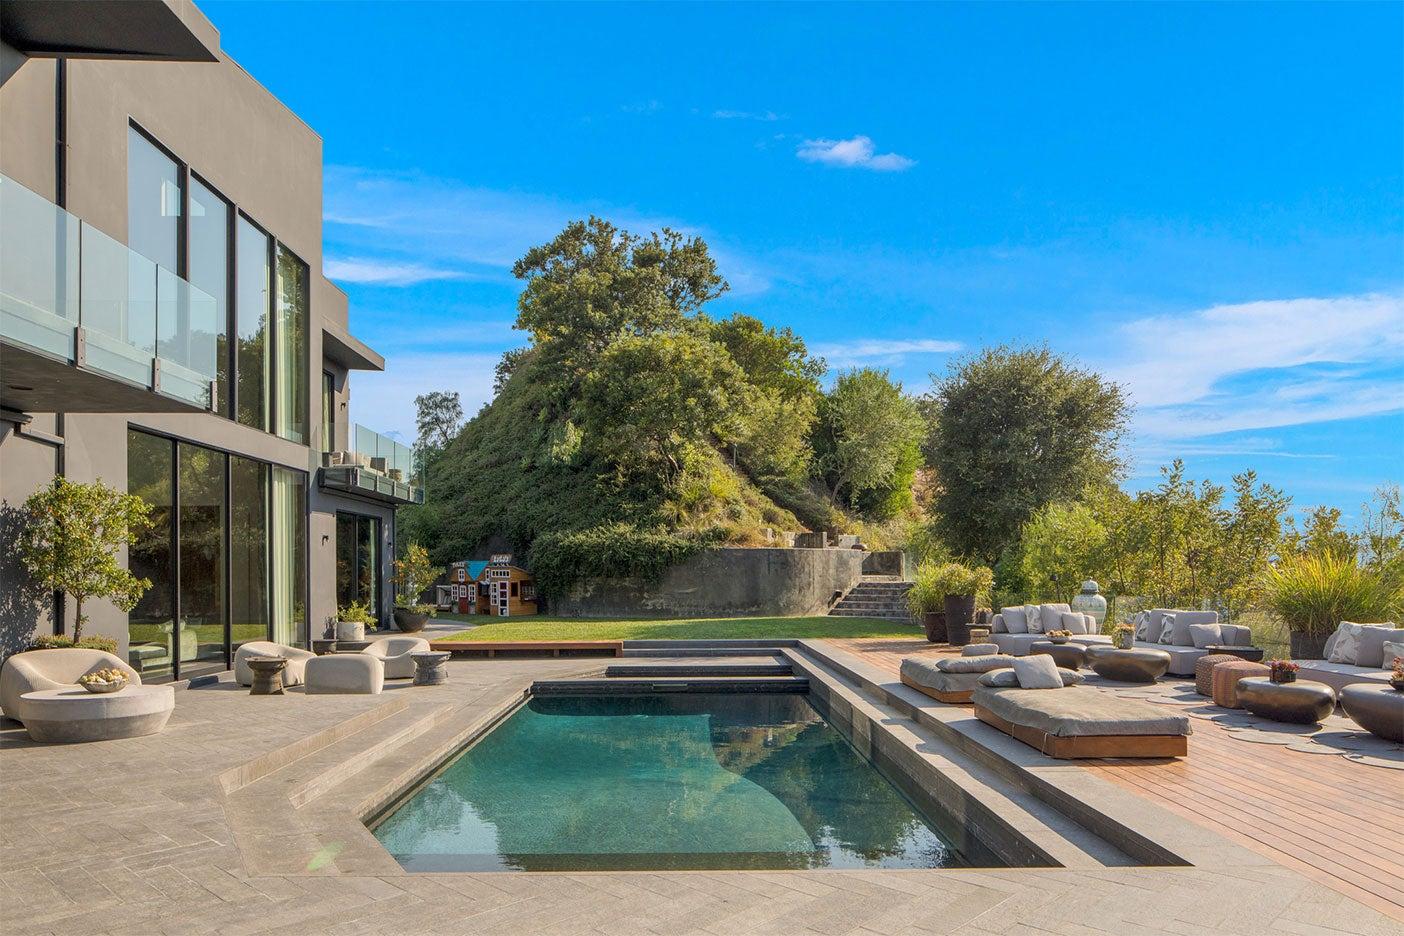 dark exterior with pool